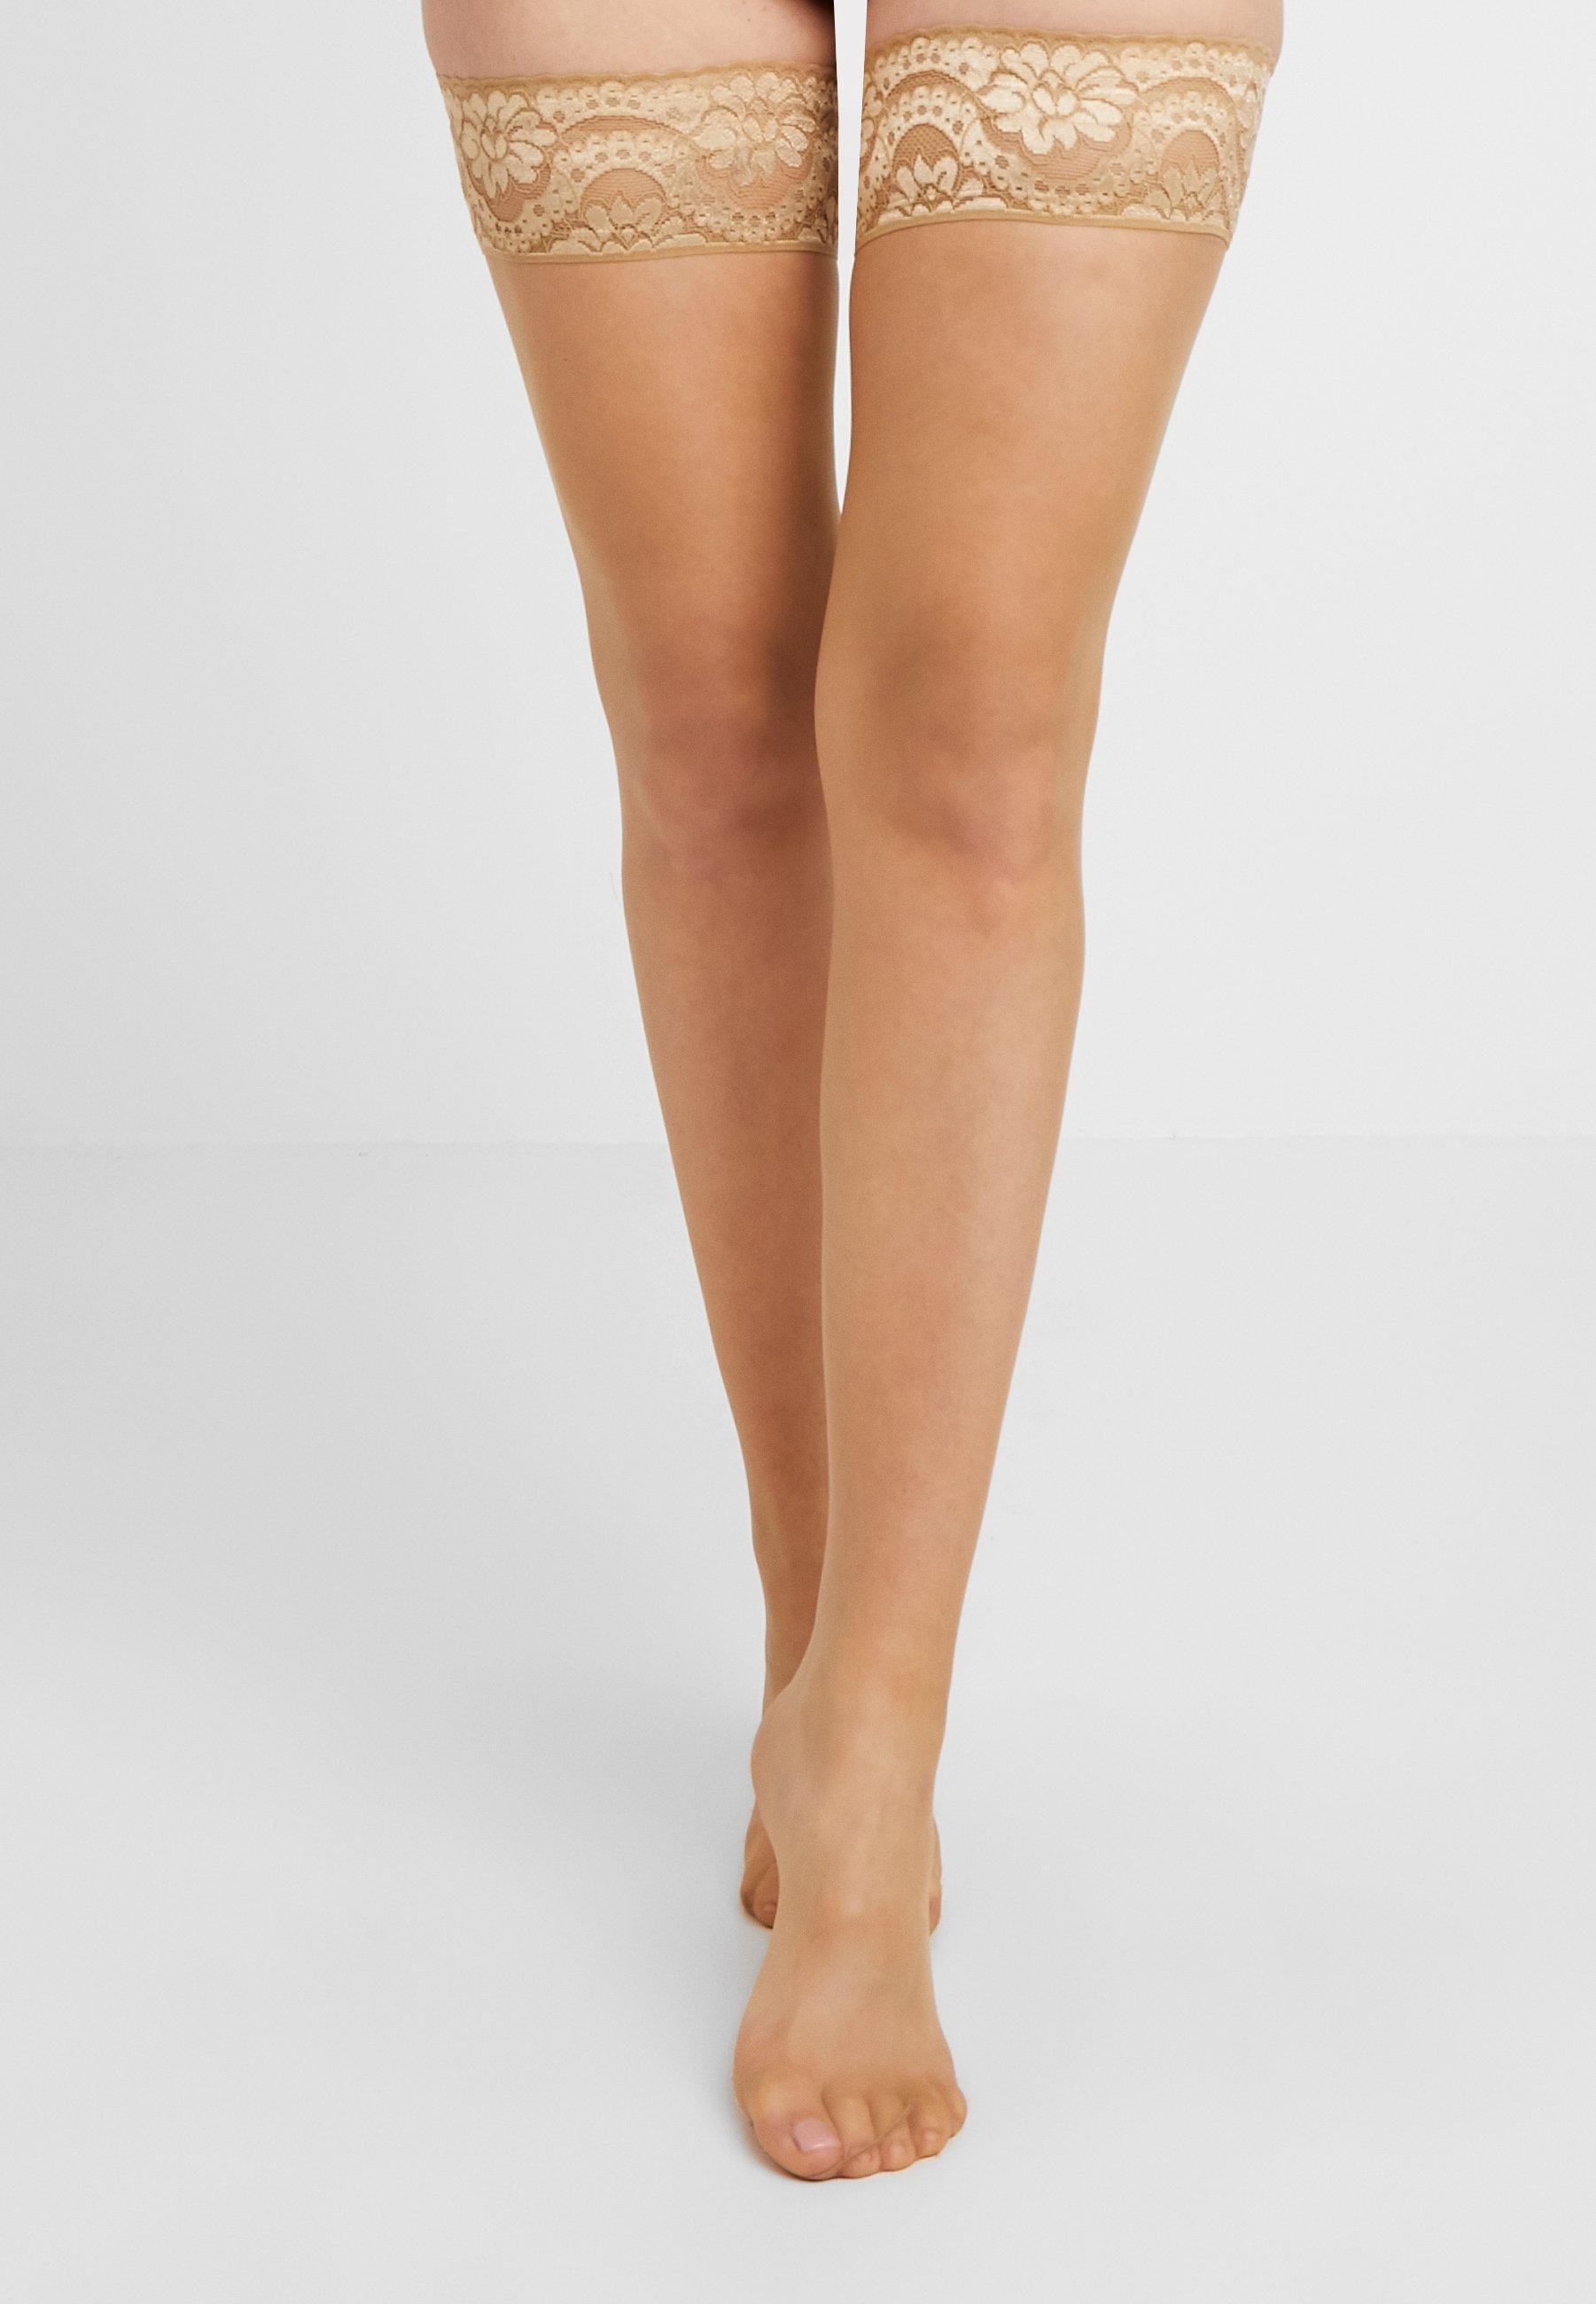 Women MYSTIQUE - Over-the-knee socks